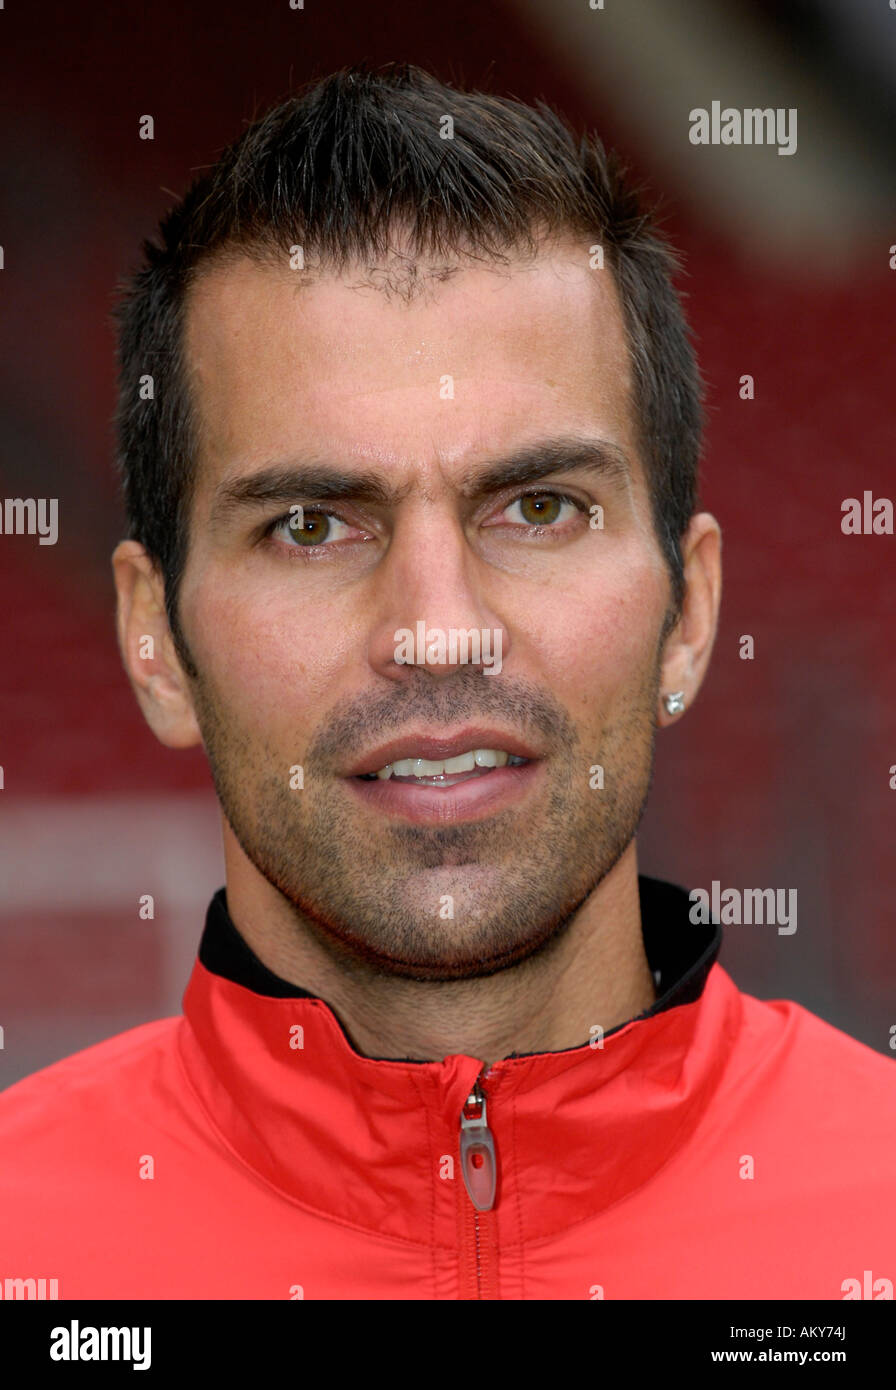 Assistant coach Markus BABBEL VfB Stuttgart - Stock Image